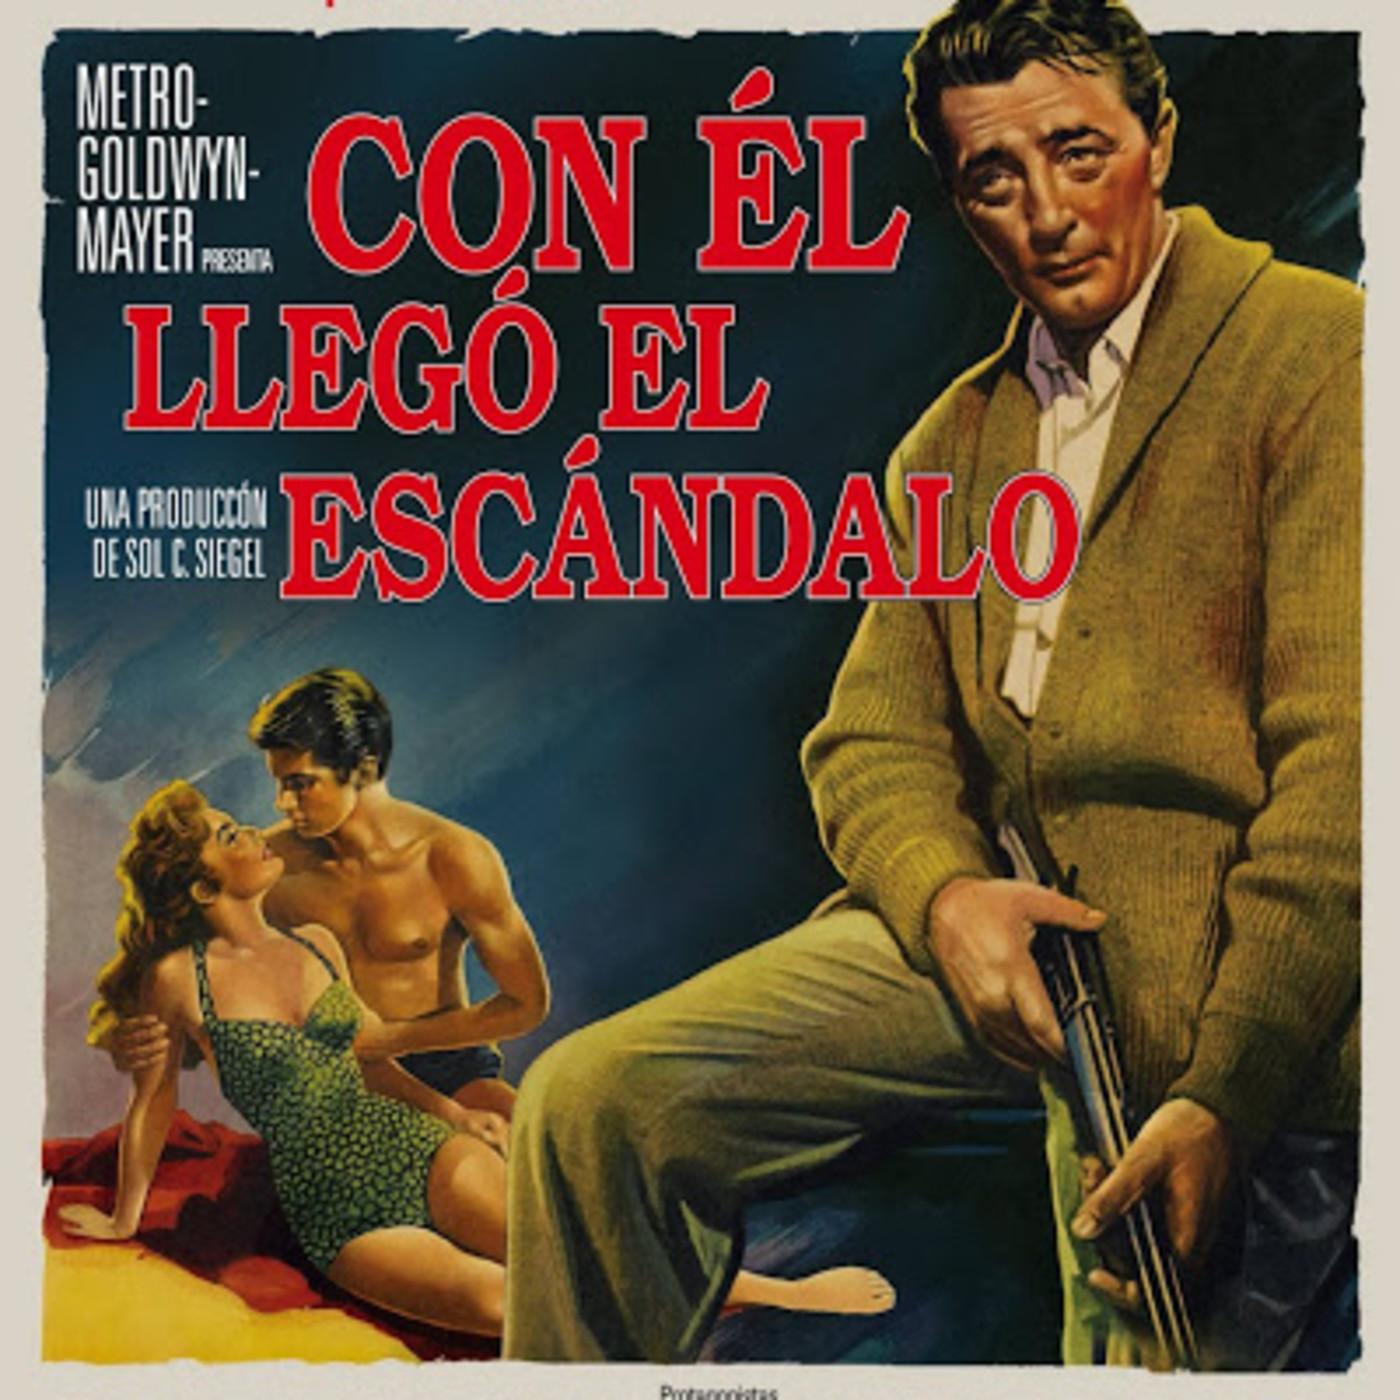 Con él Llegó el Escándalo (1960) #Drama #Caza #peliculas #audesc #podcast